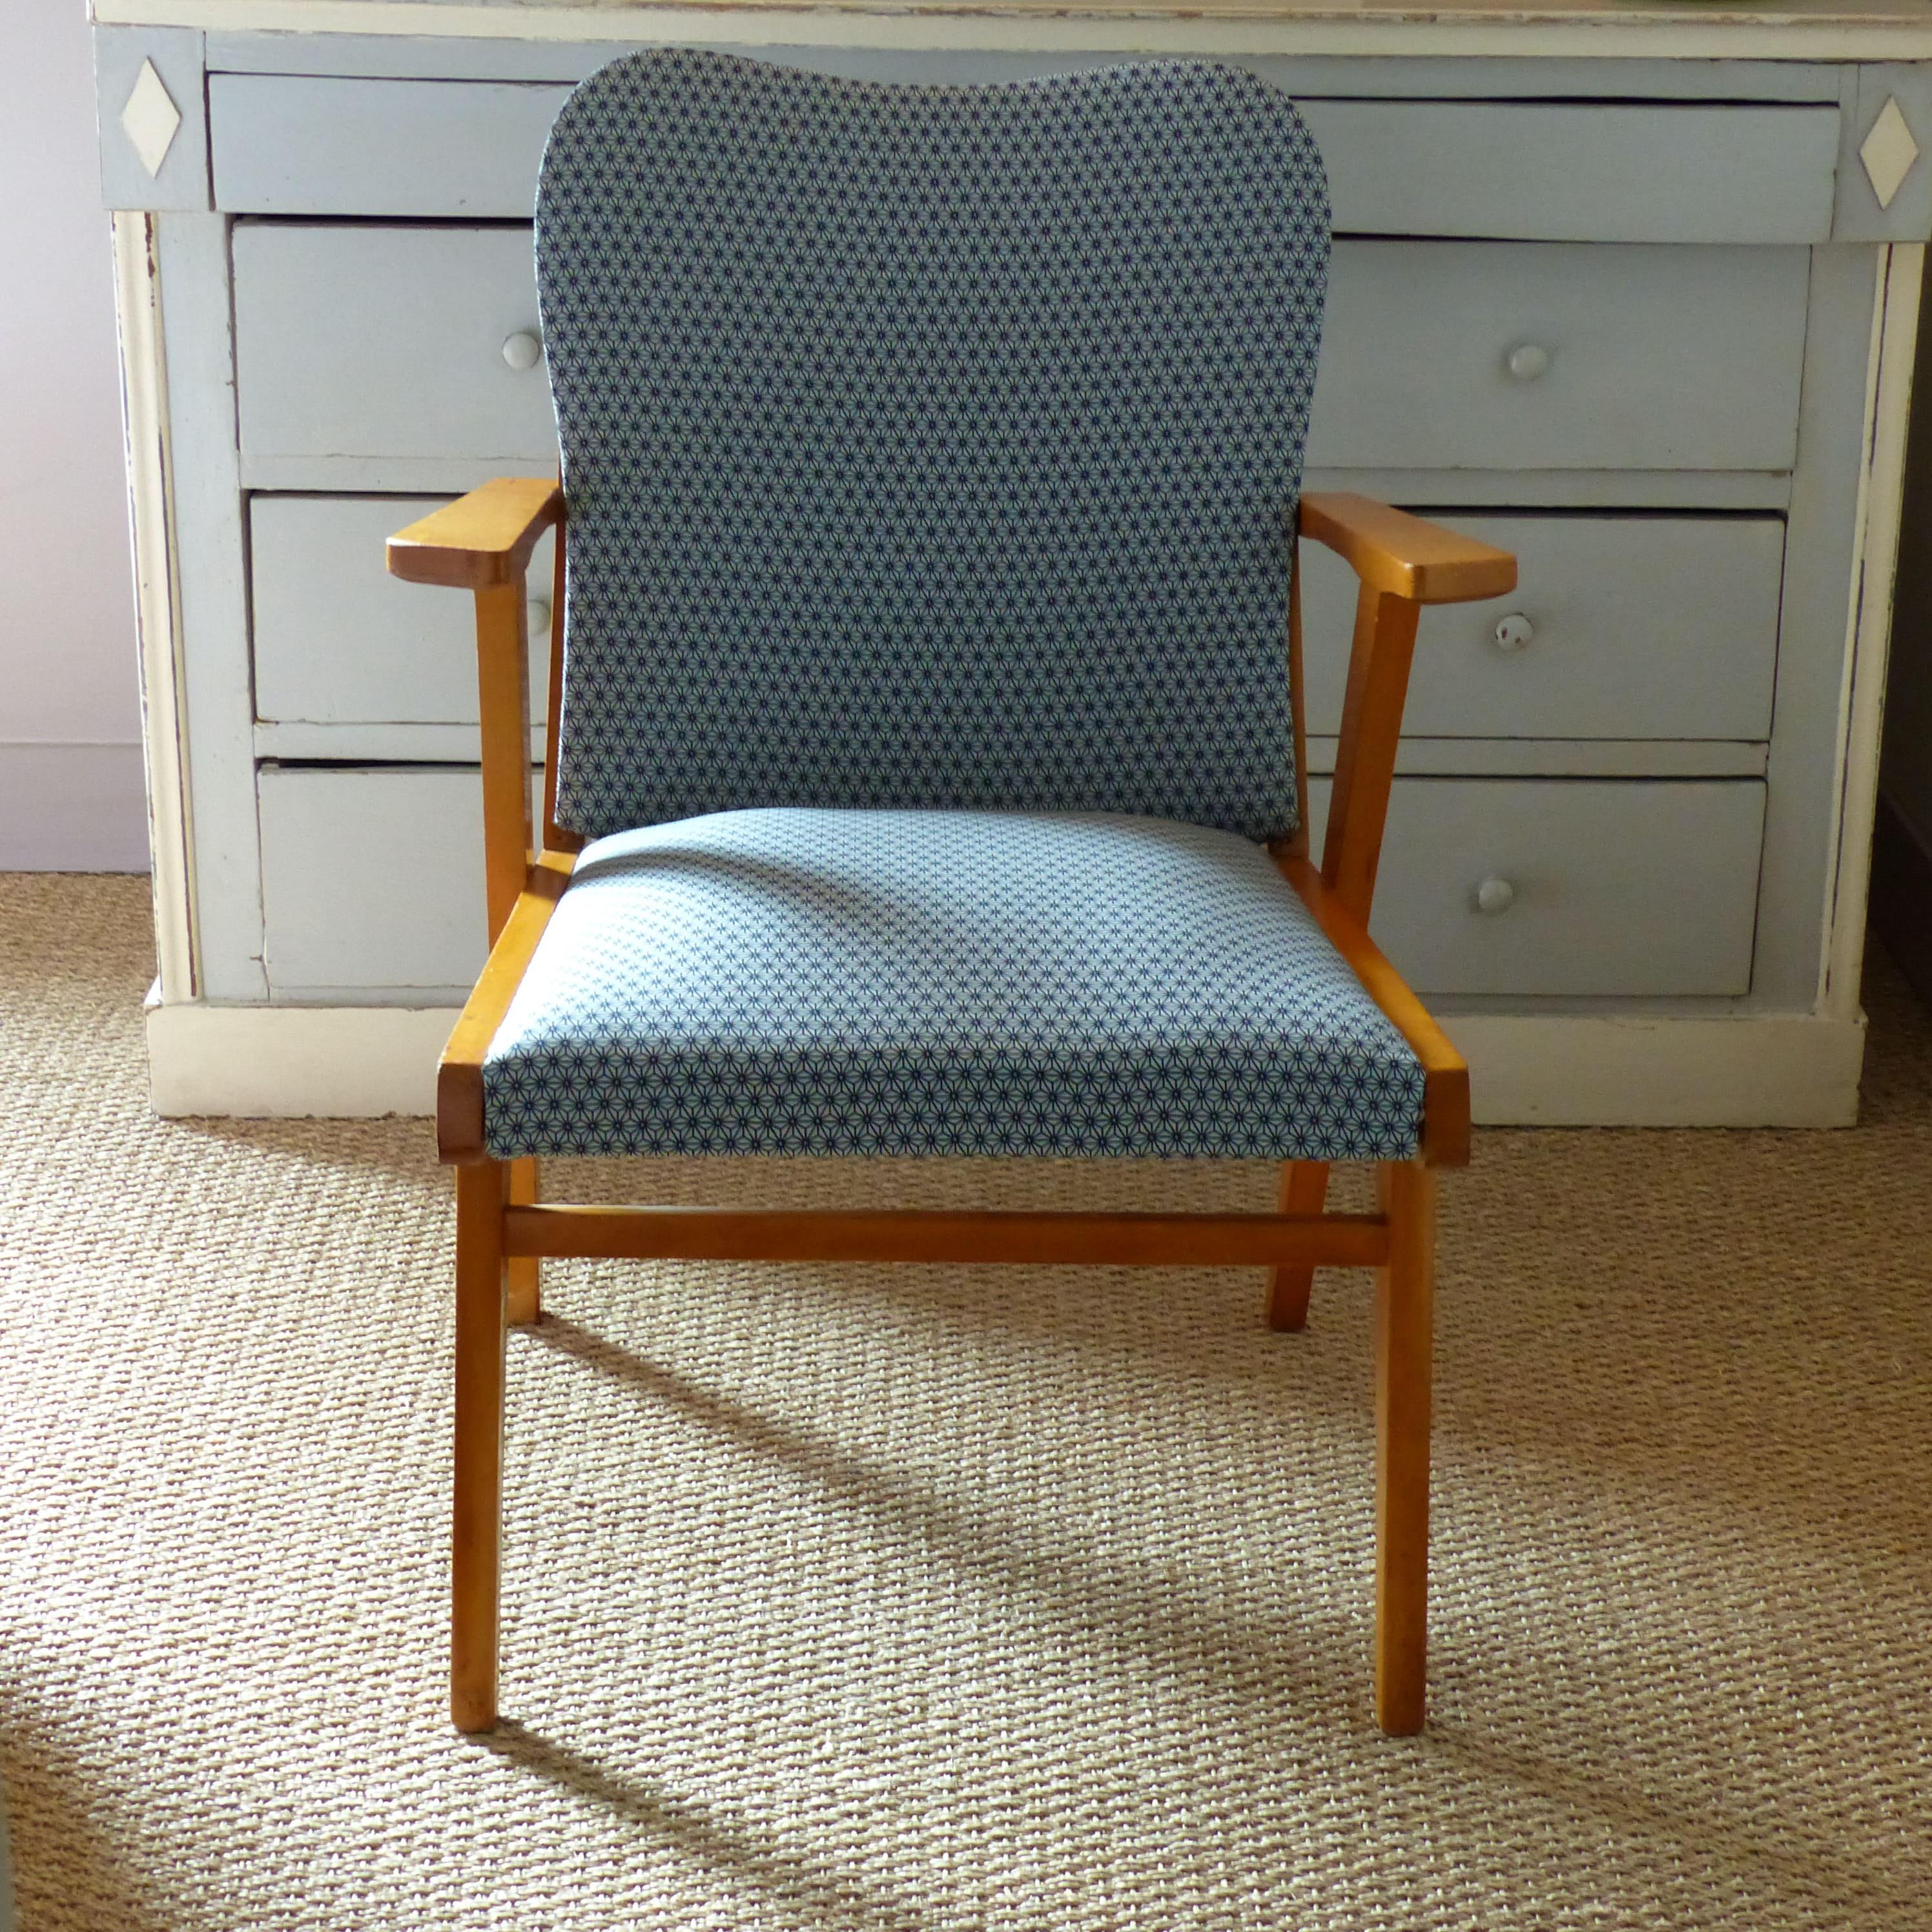 dimension d un rocking chair mpfmpf almirah beds wardrobes and furniture